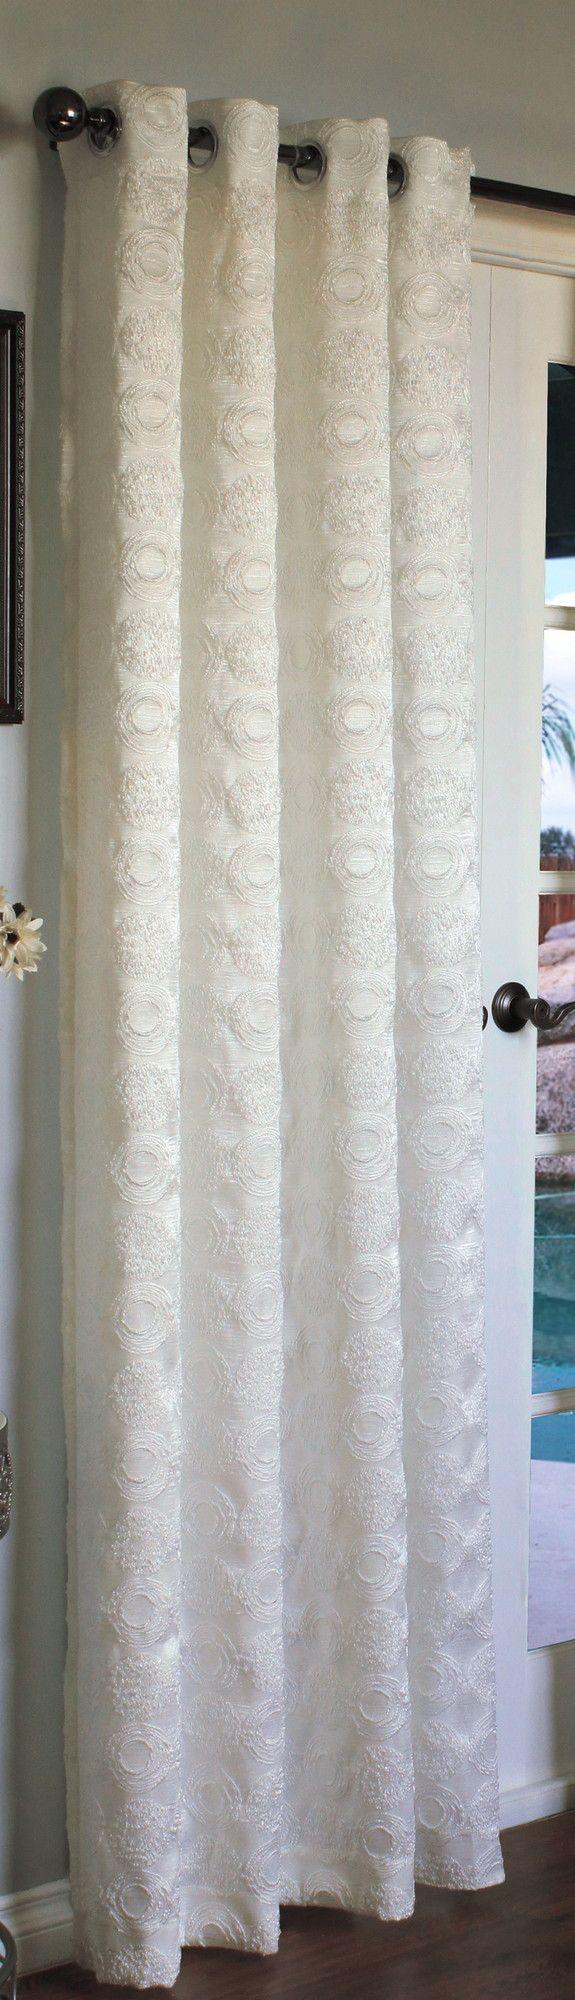 Home gt curtains collection gt modern curtains gt elegant pink un - Montross Grommet Single Curtain Panel